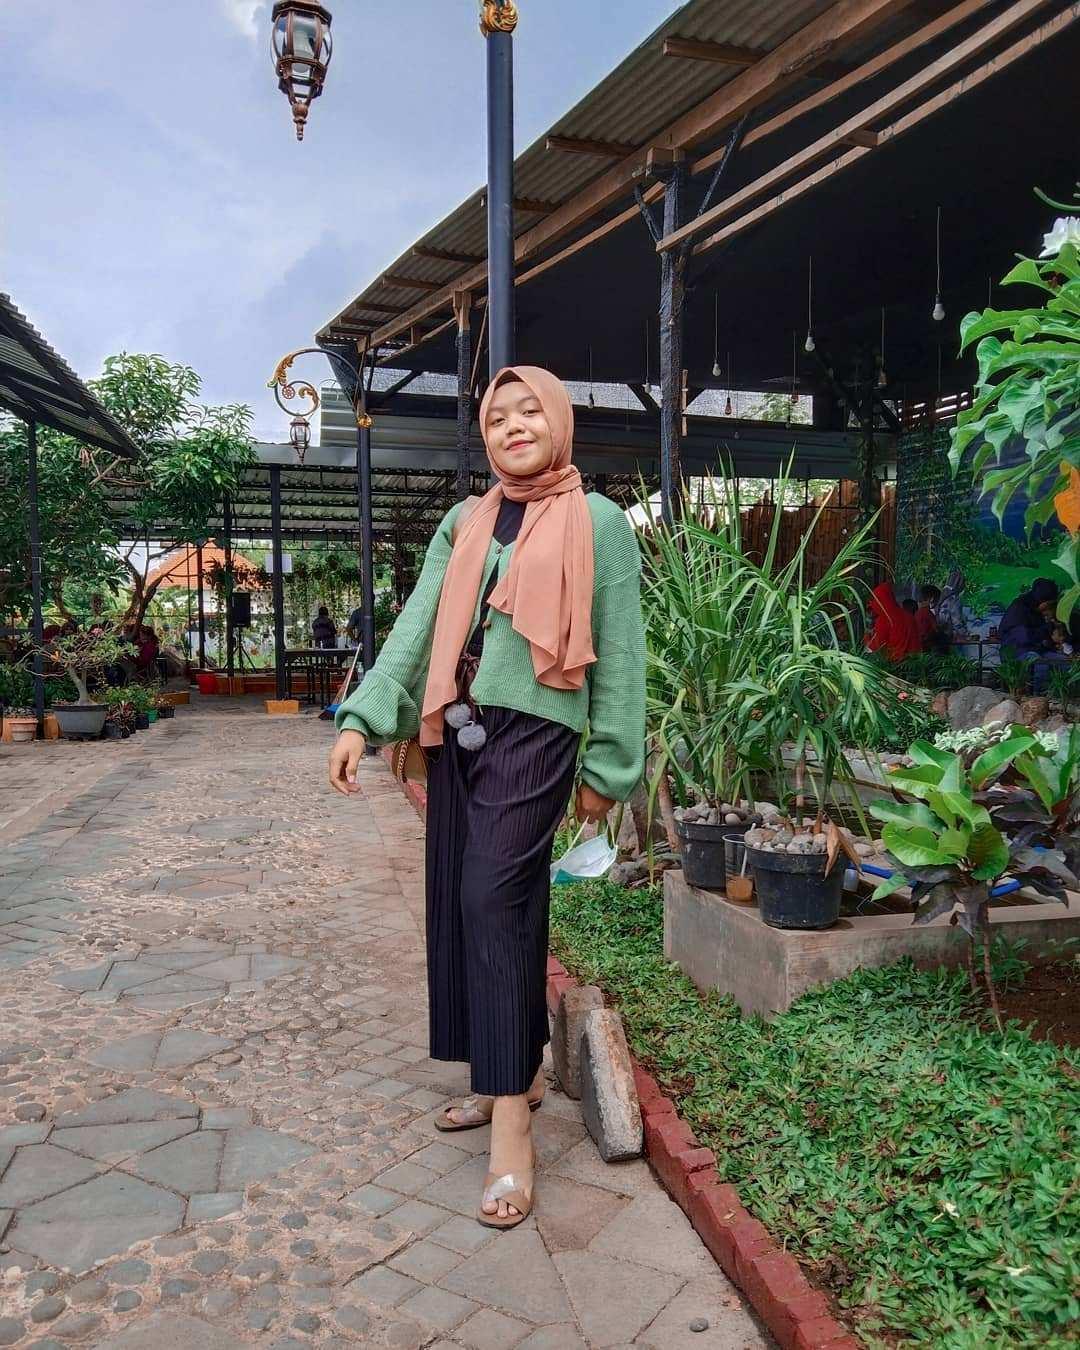 Berfoto di Djaja Cafe Pasuruan Image From @alfimaulidia